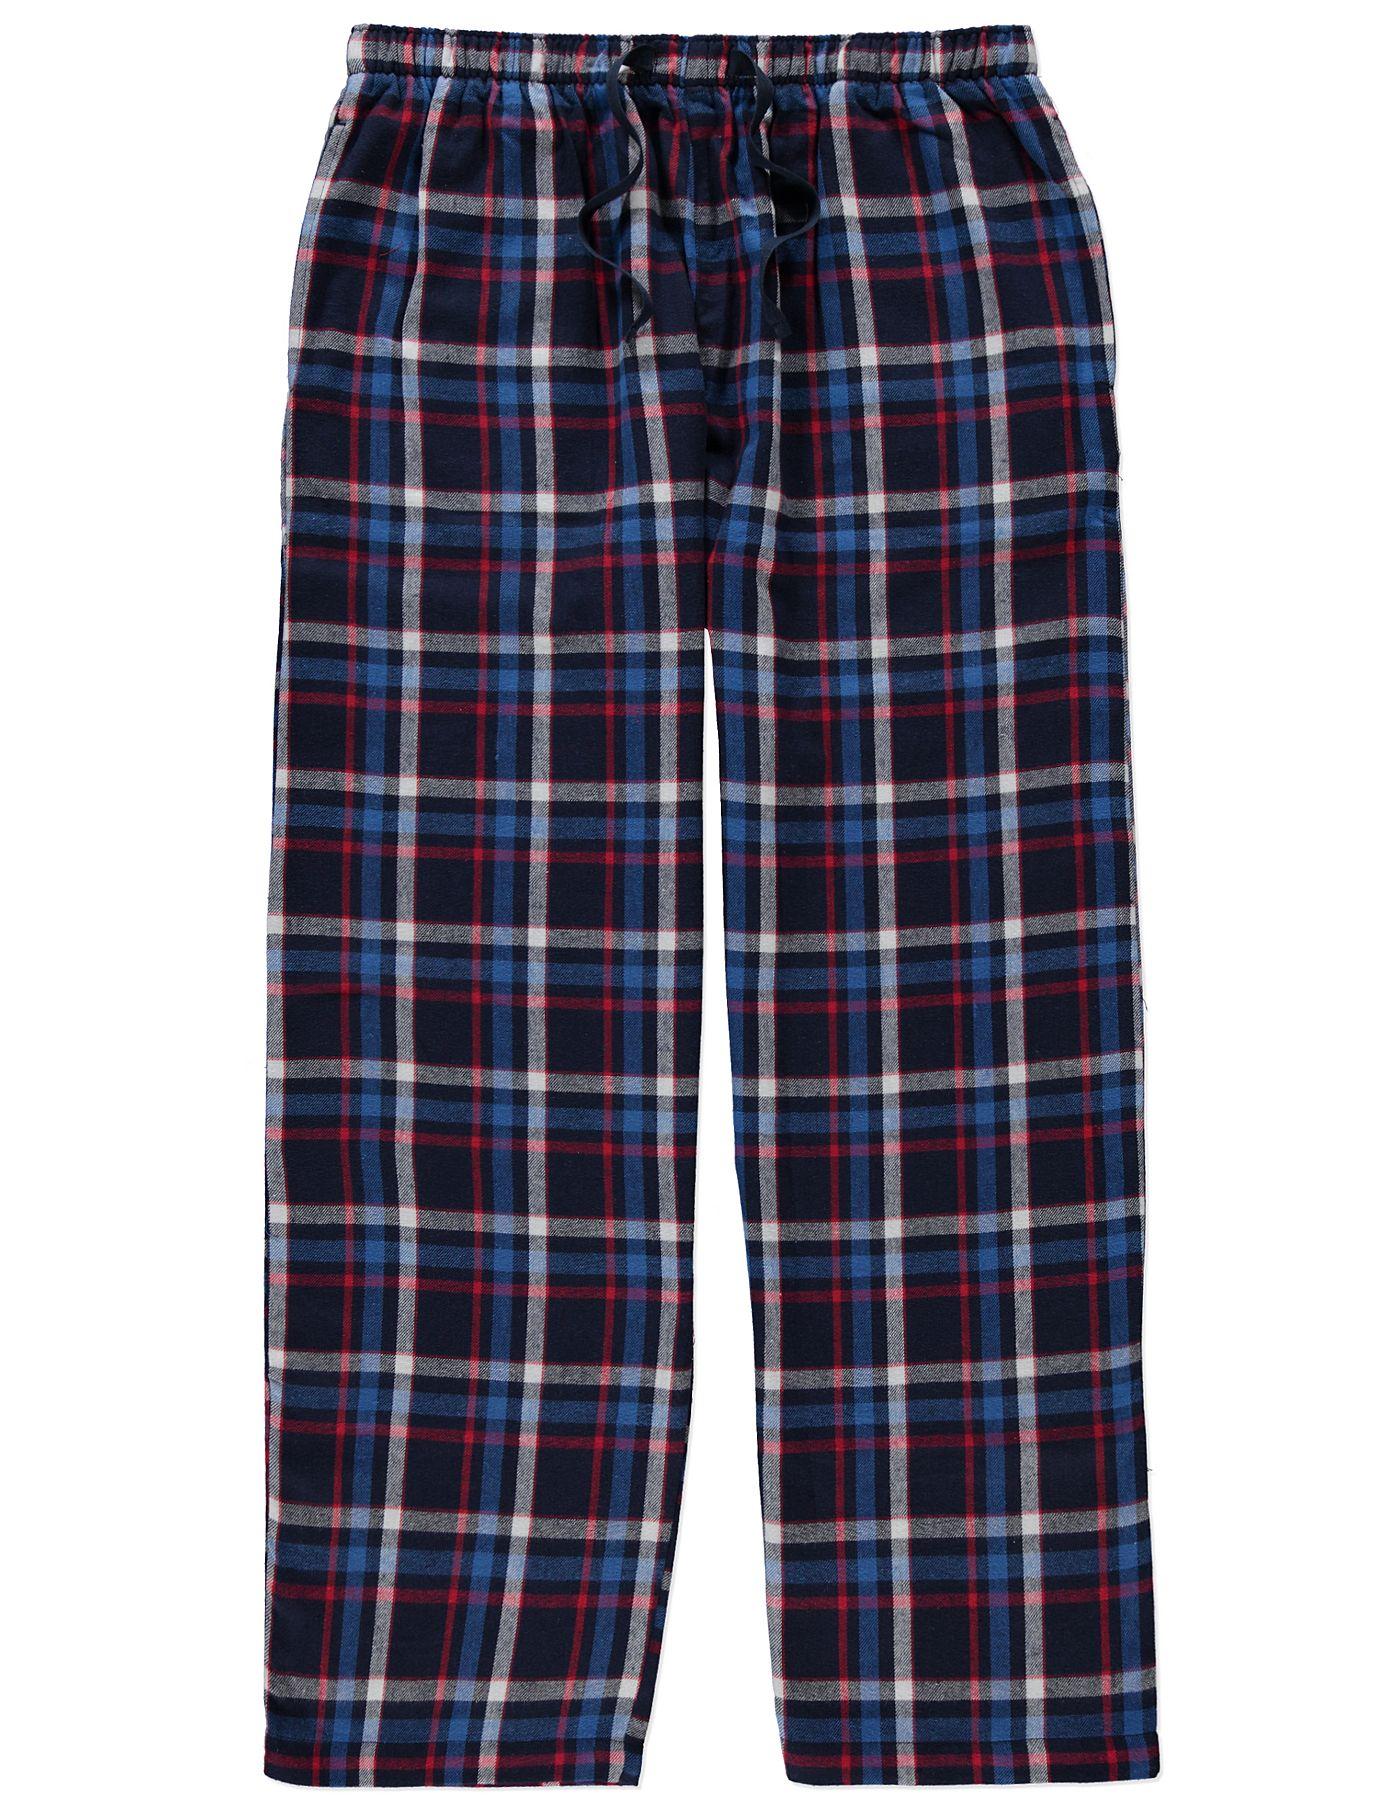 Woven Check Pyjama Bottoms | Men | George at ASDA | love | Pinterest ...